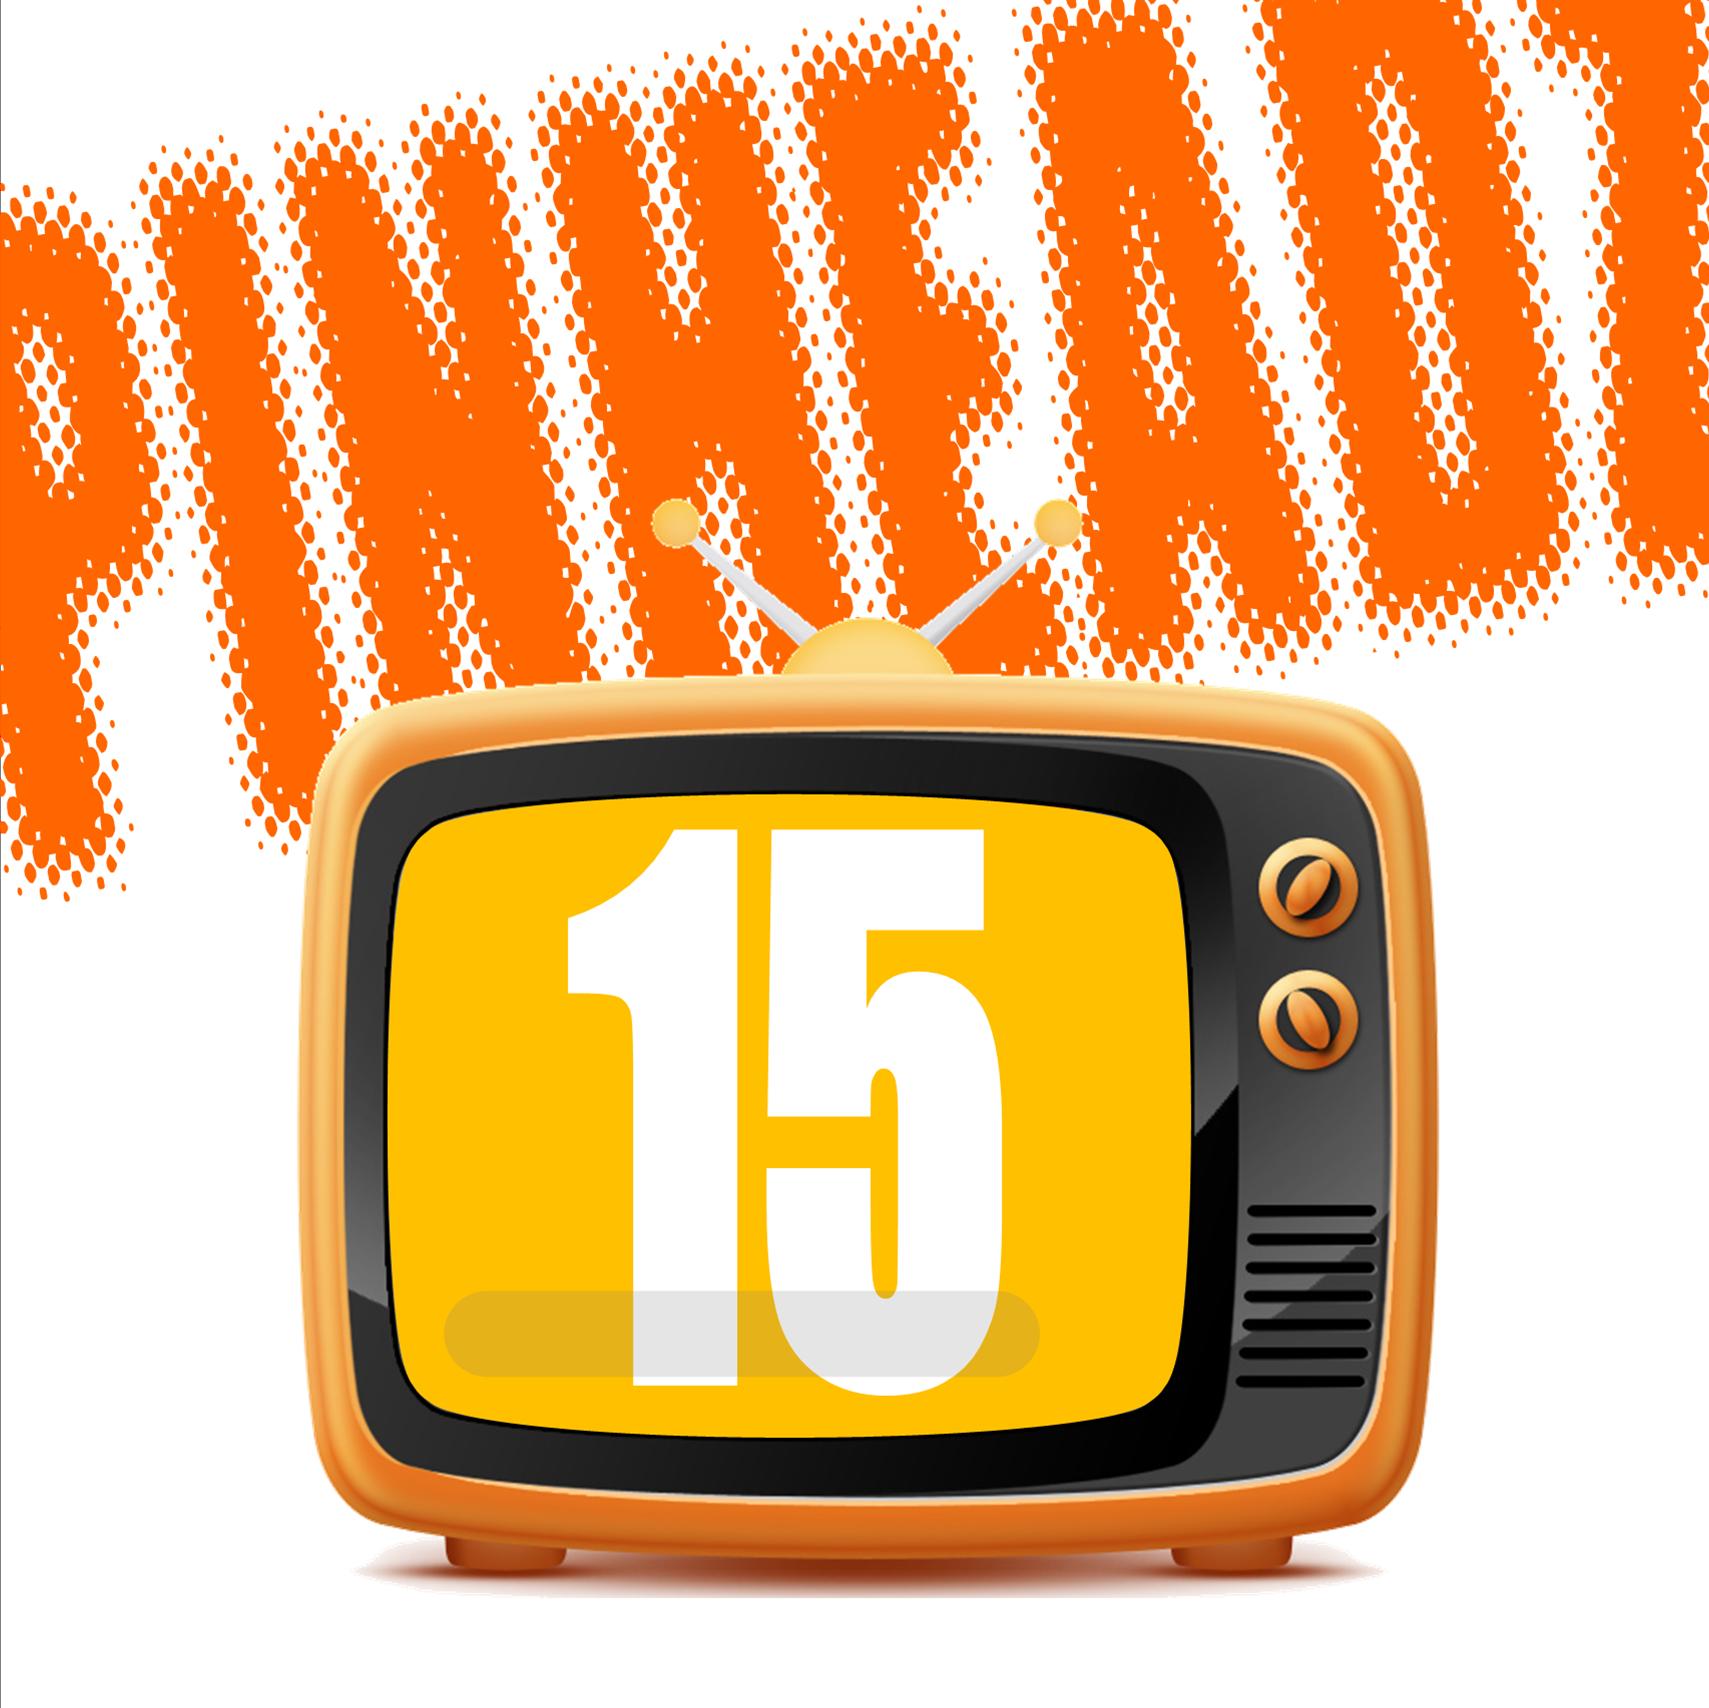 PPPo15 logo